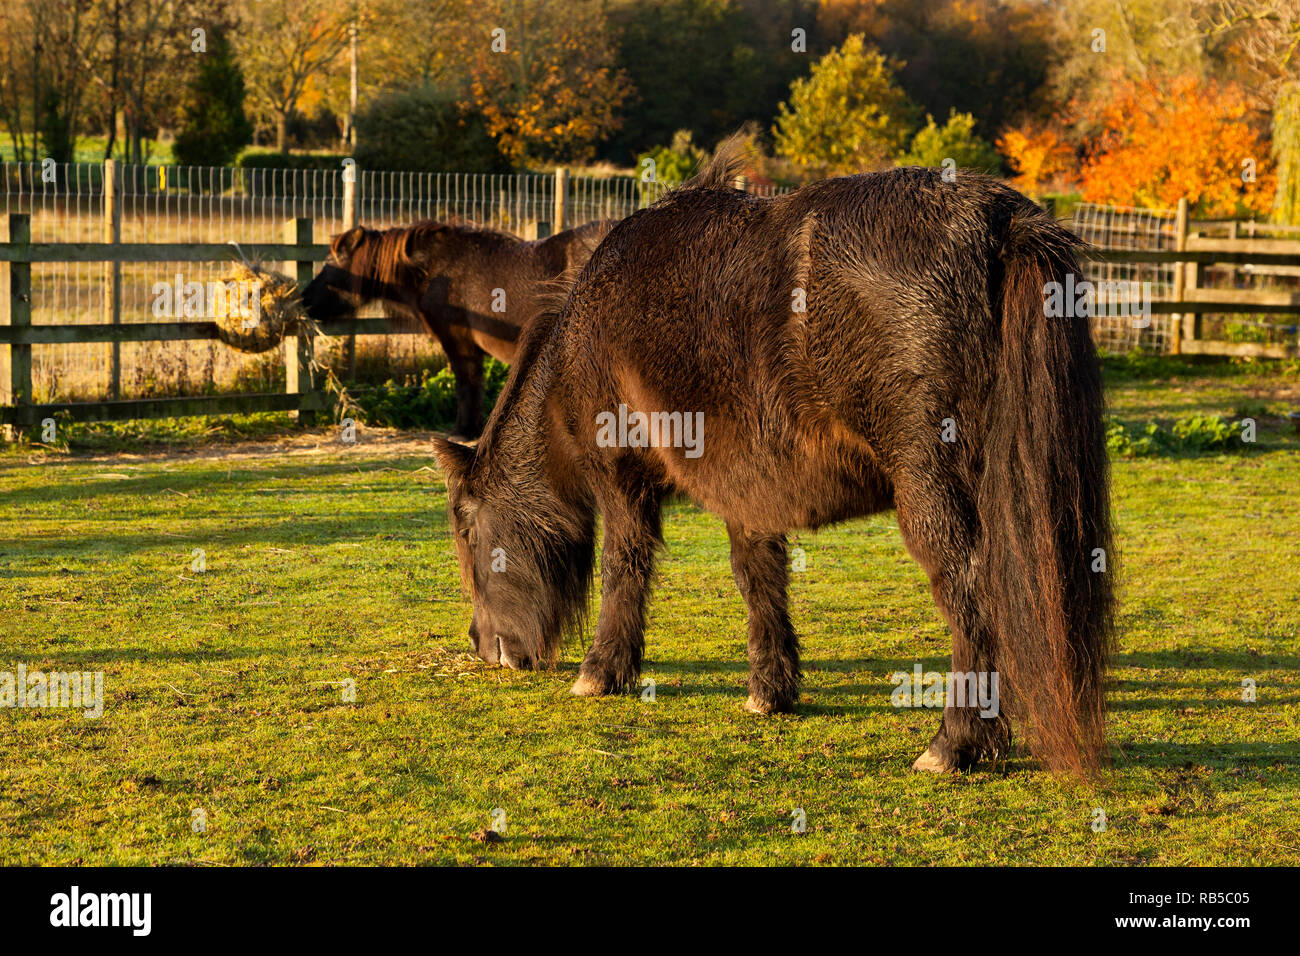 Farming Diversification. Horses at livery - Stock Image